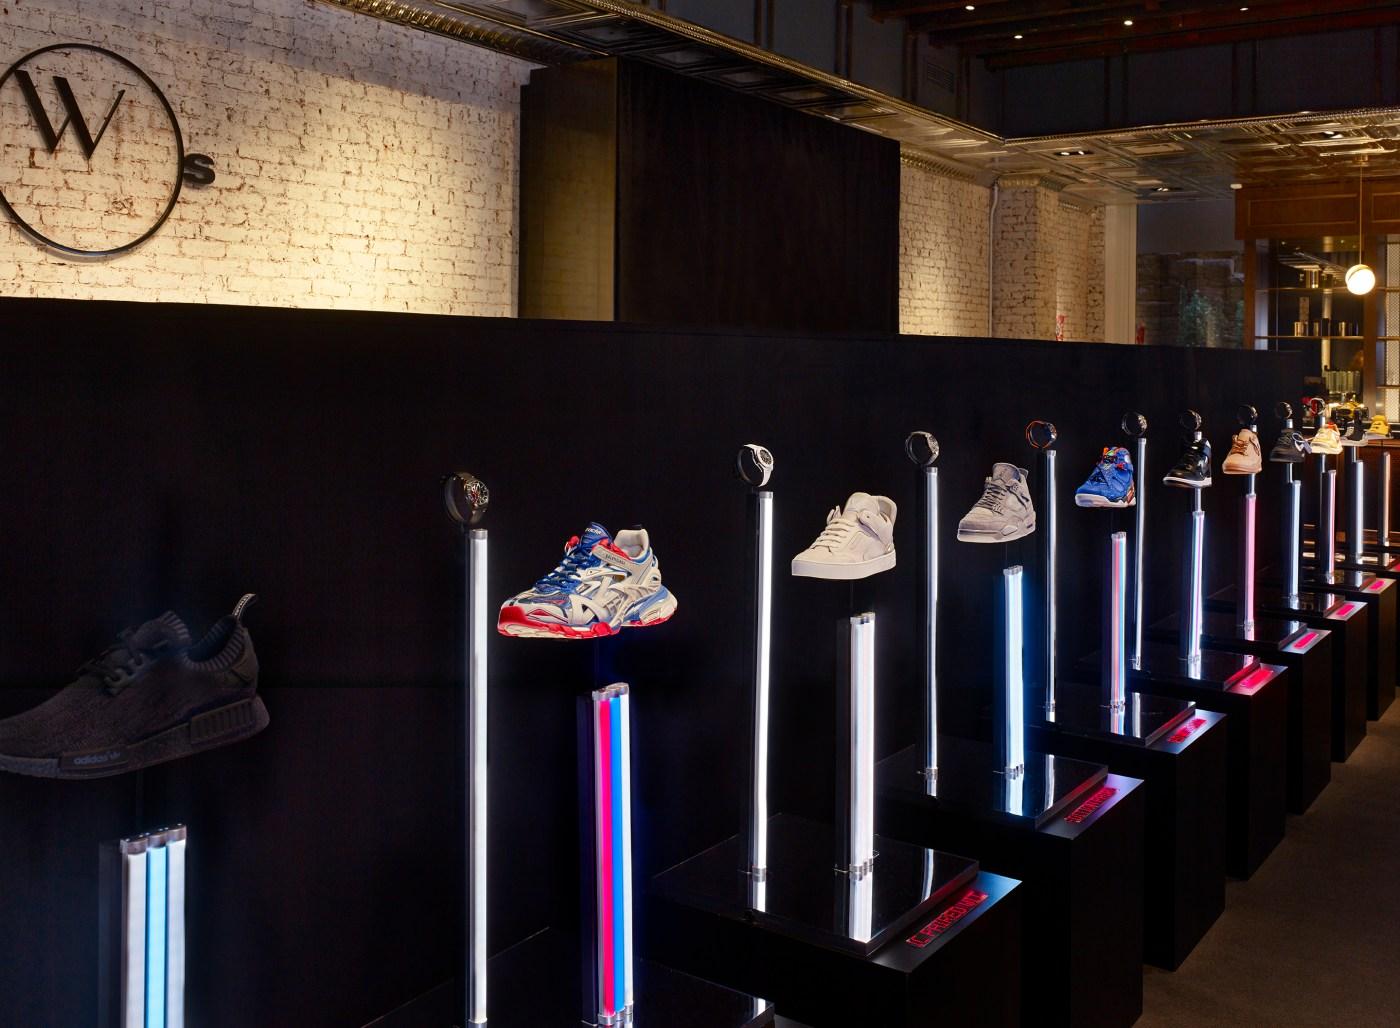 WOS #SneakerTime display Photo by Peter Murdock